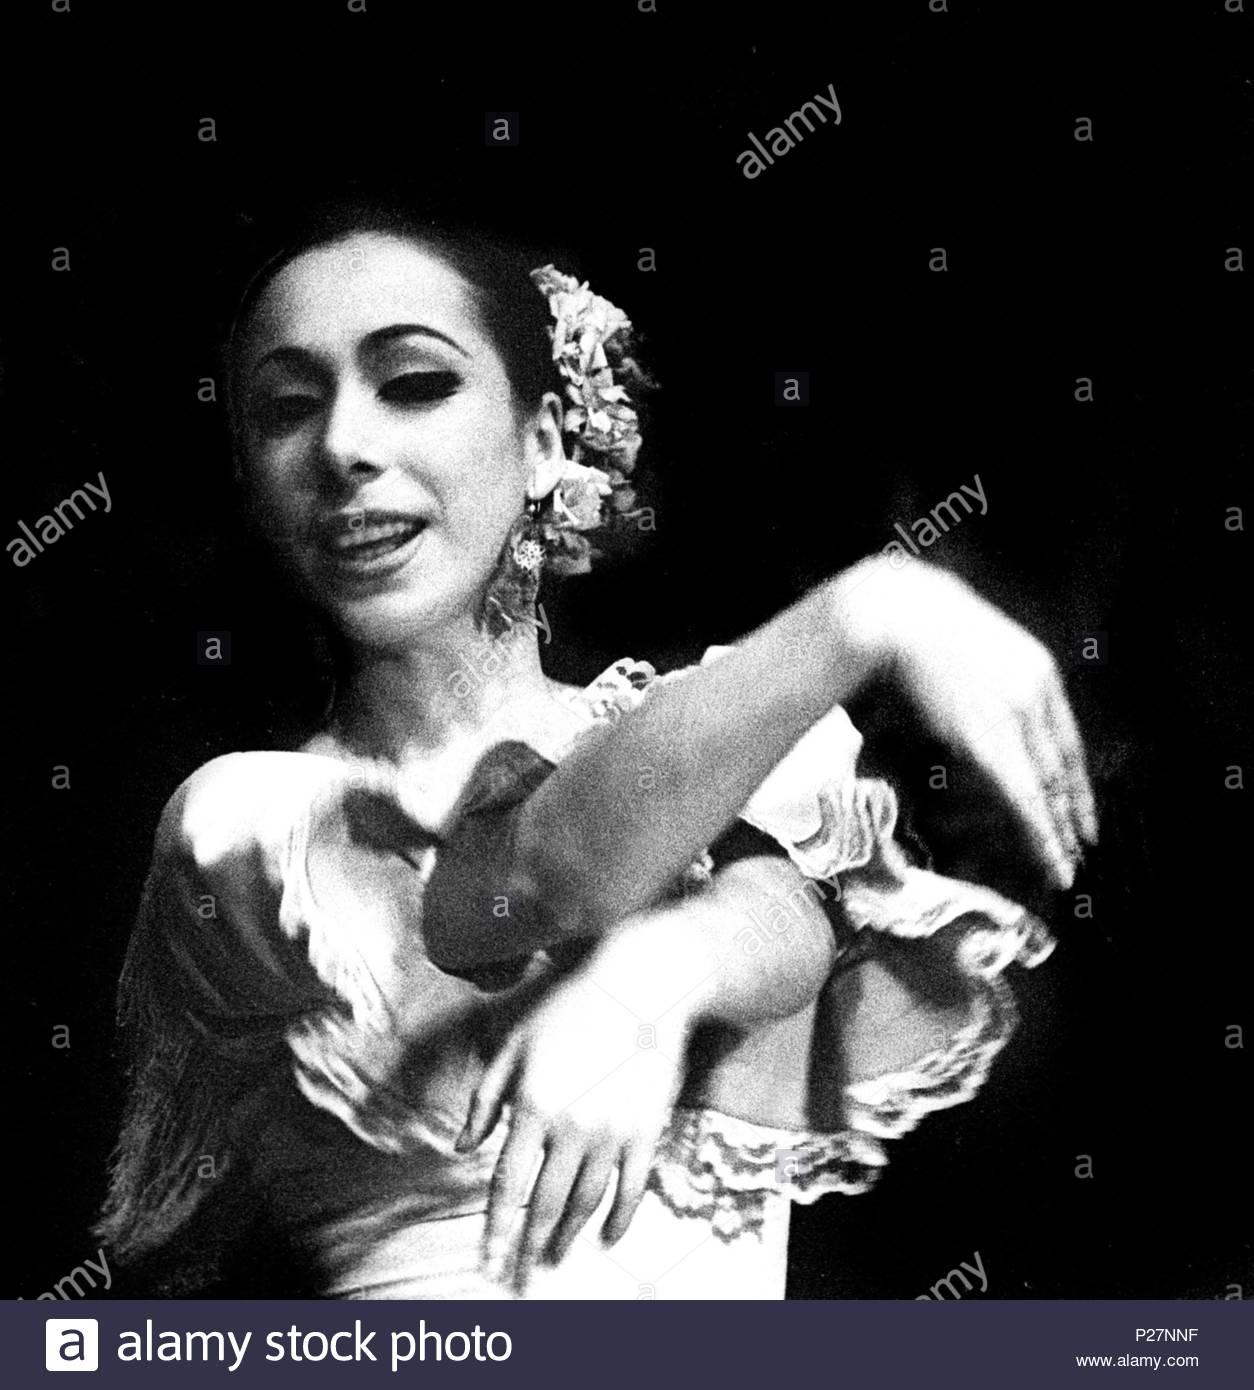 Forum on this topic: Blythe Duff (born 1962), cristina-aragon-b-1932/